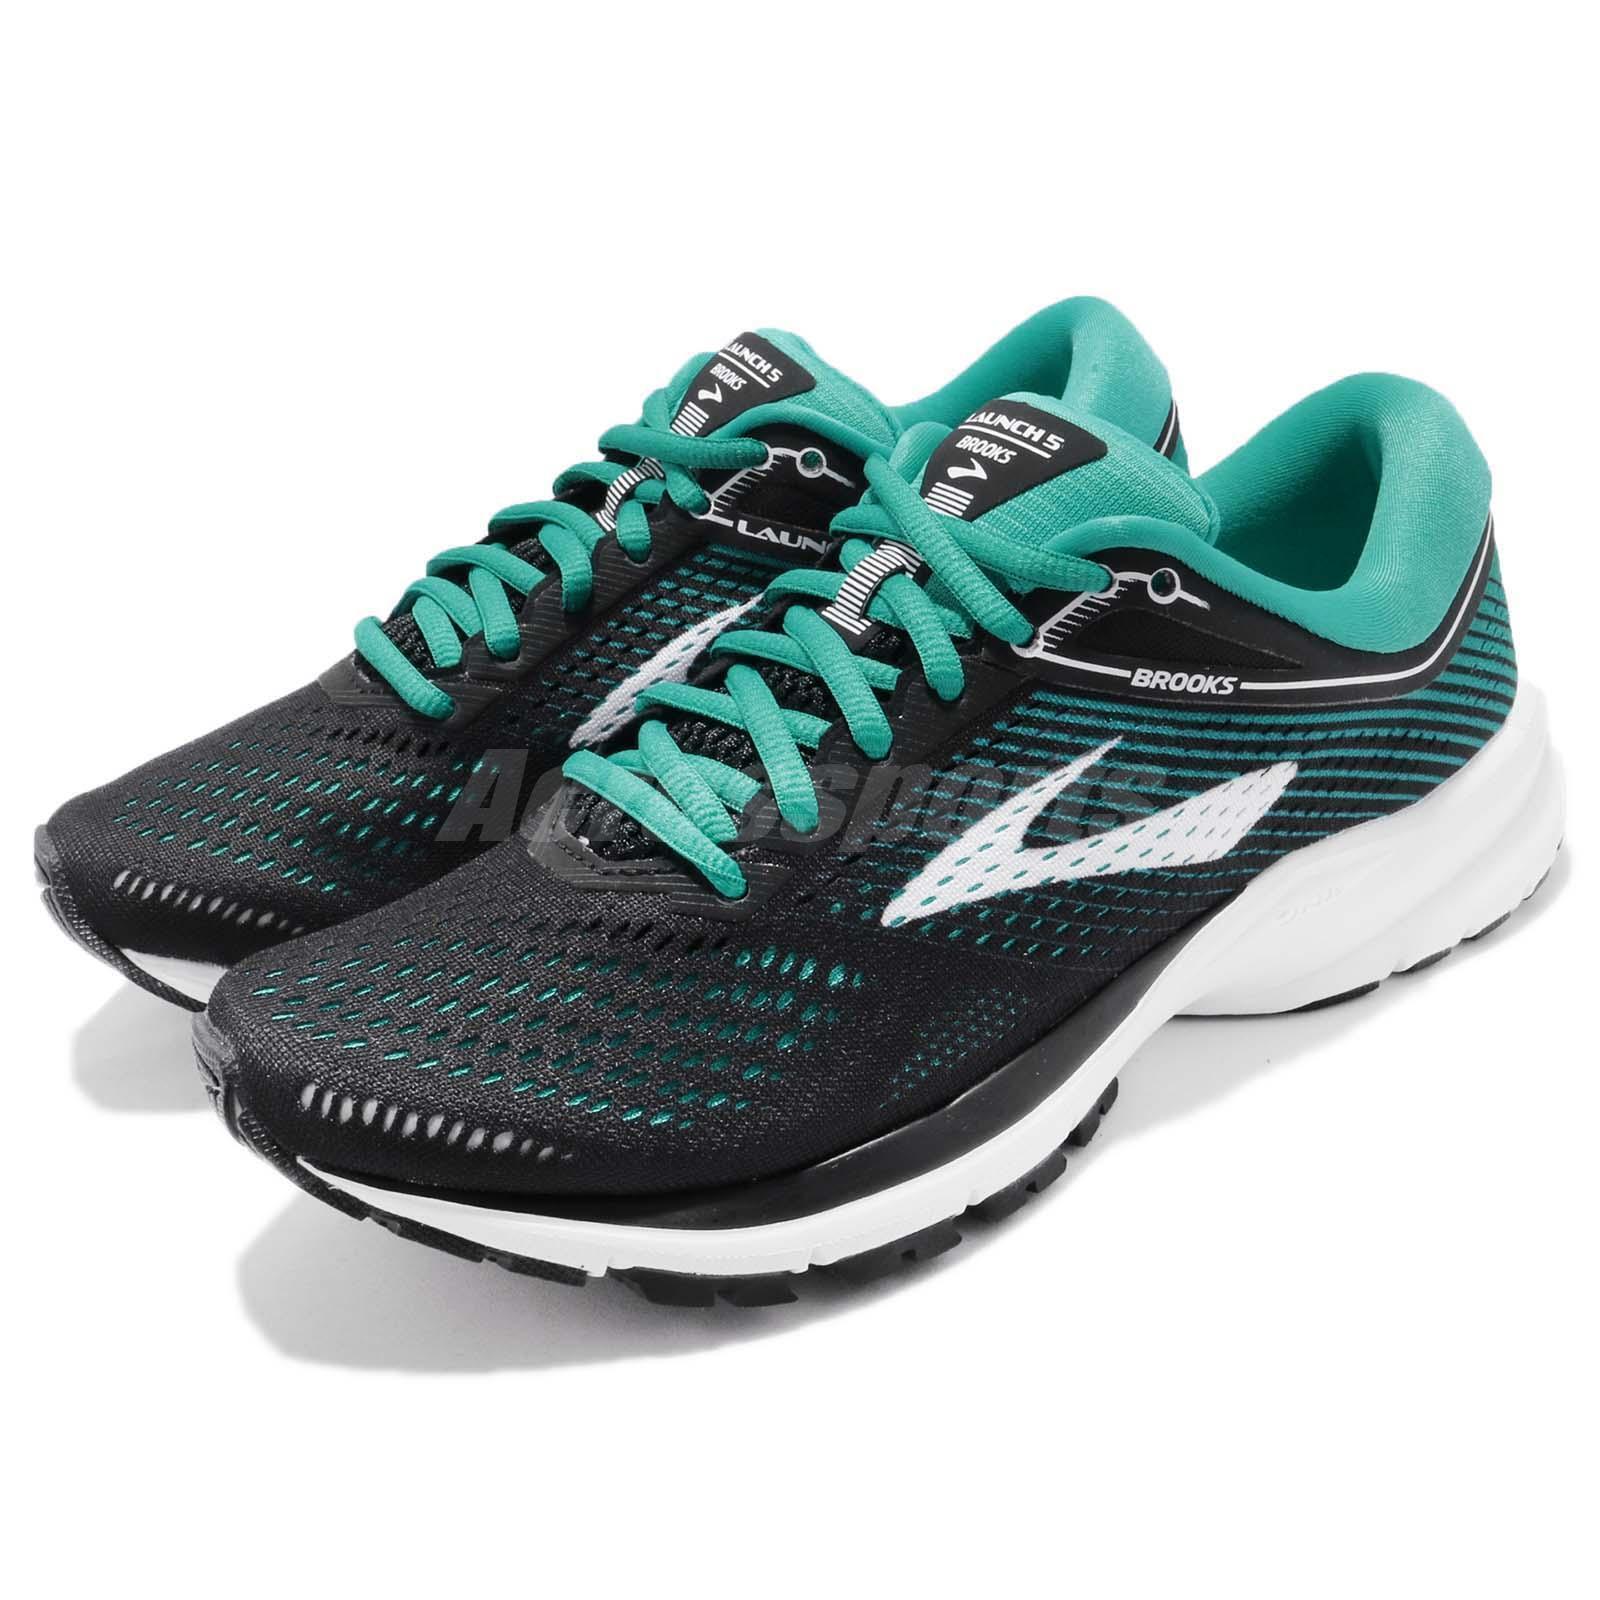 Brooks Launch 5 B V negro Teal verde mujer Running zapatos zapatillas 1202661 B